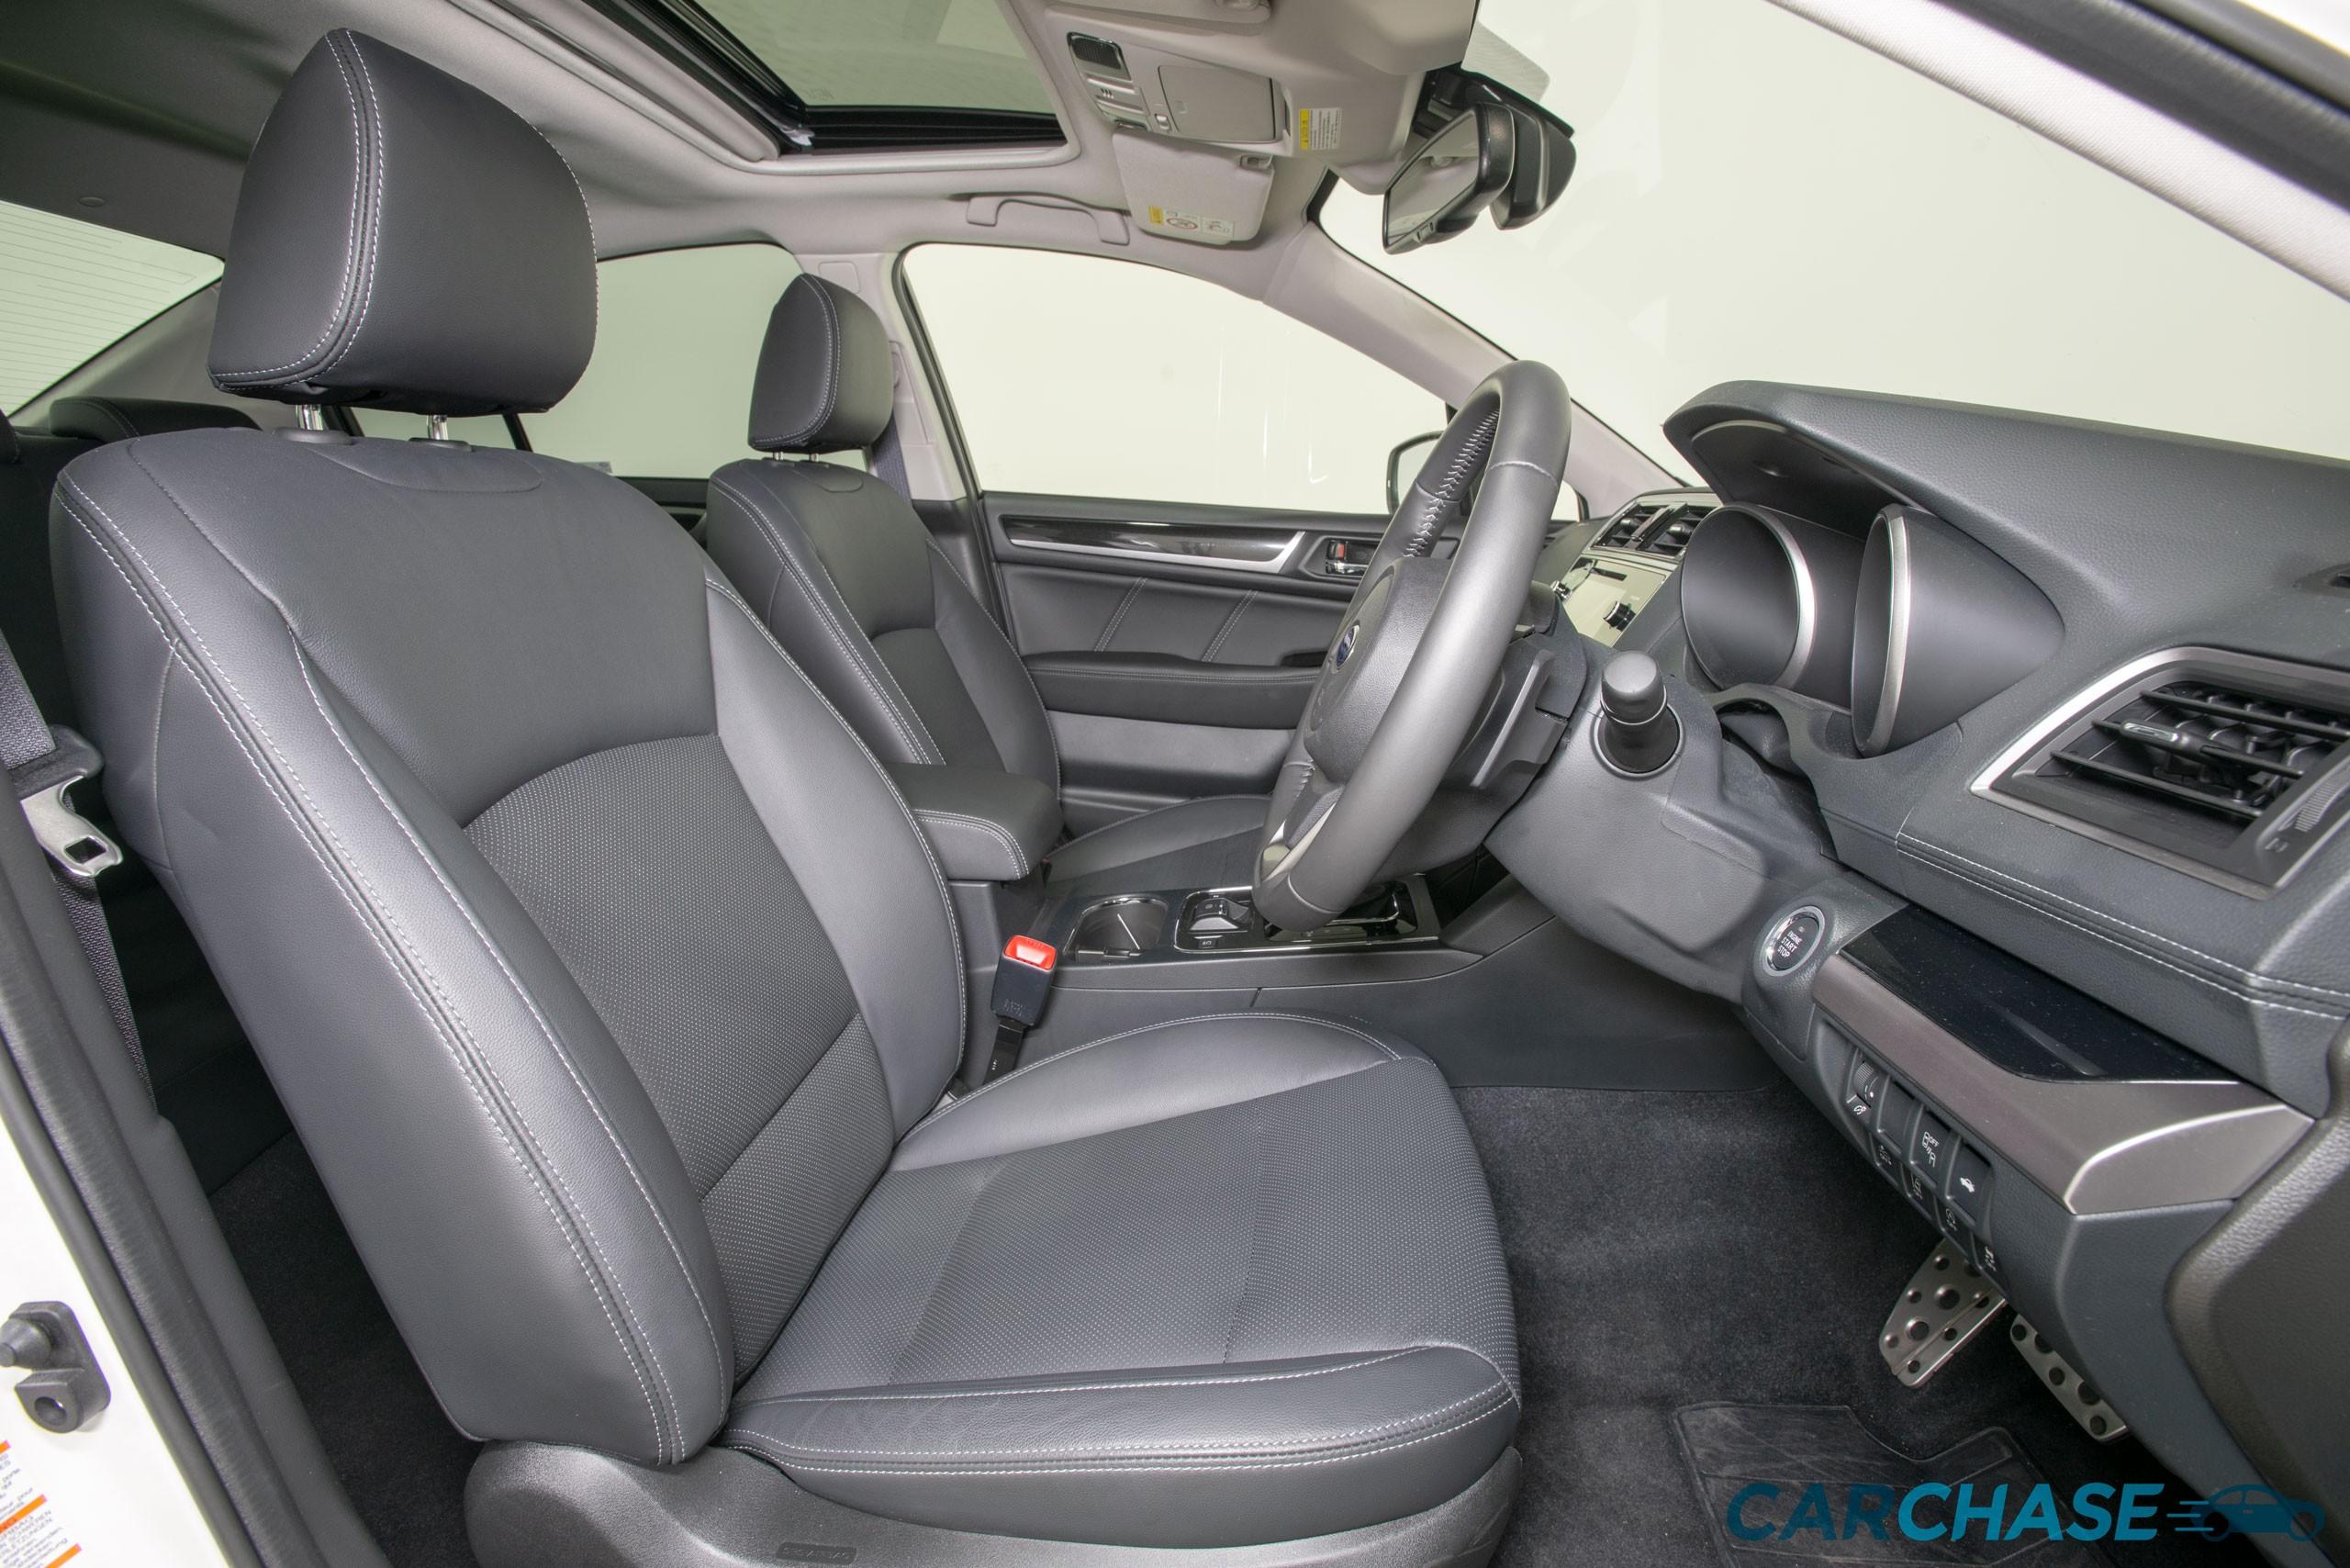 Image of driver front profile of 2018 Subaru Liberty 2.5i Premium